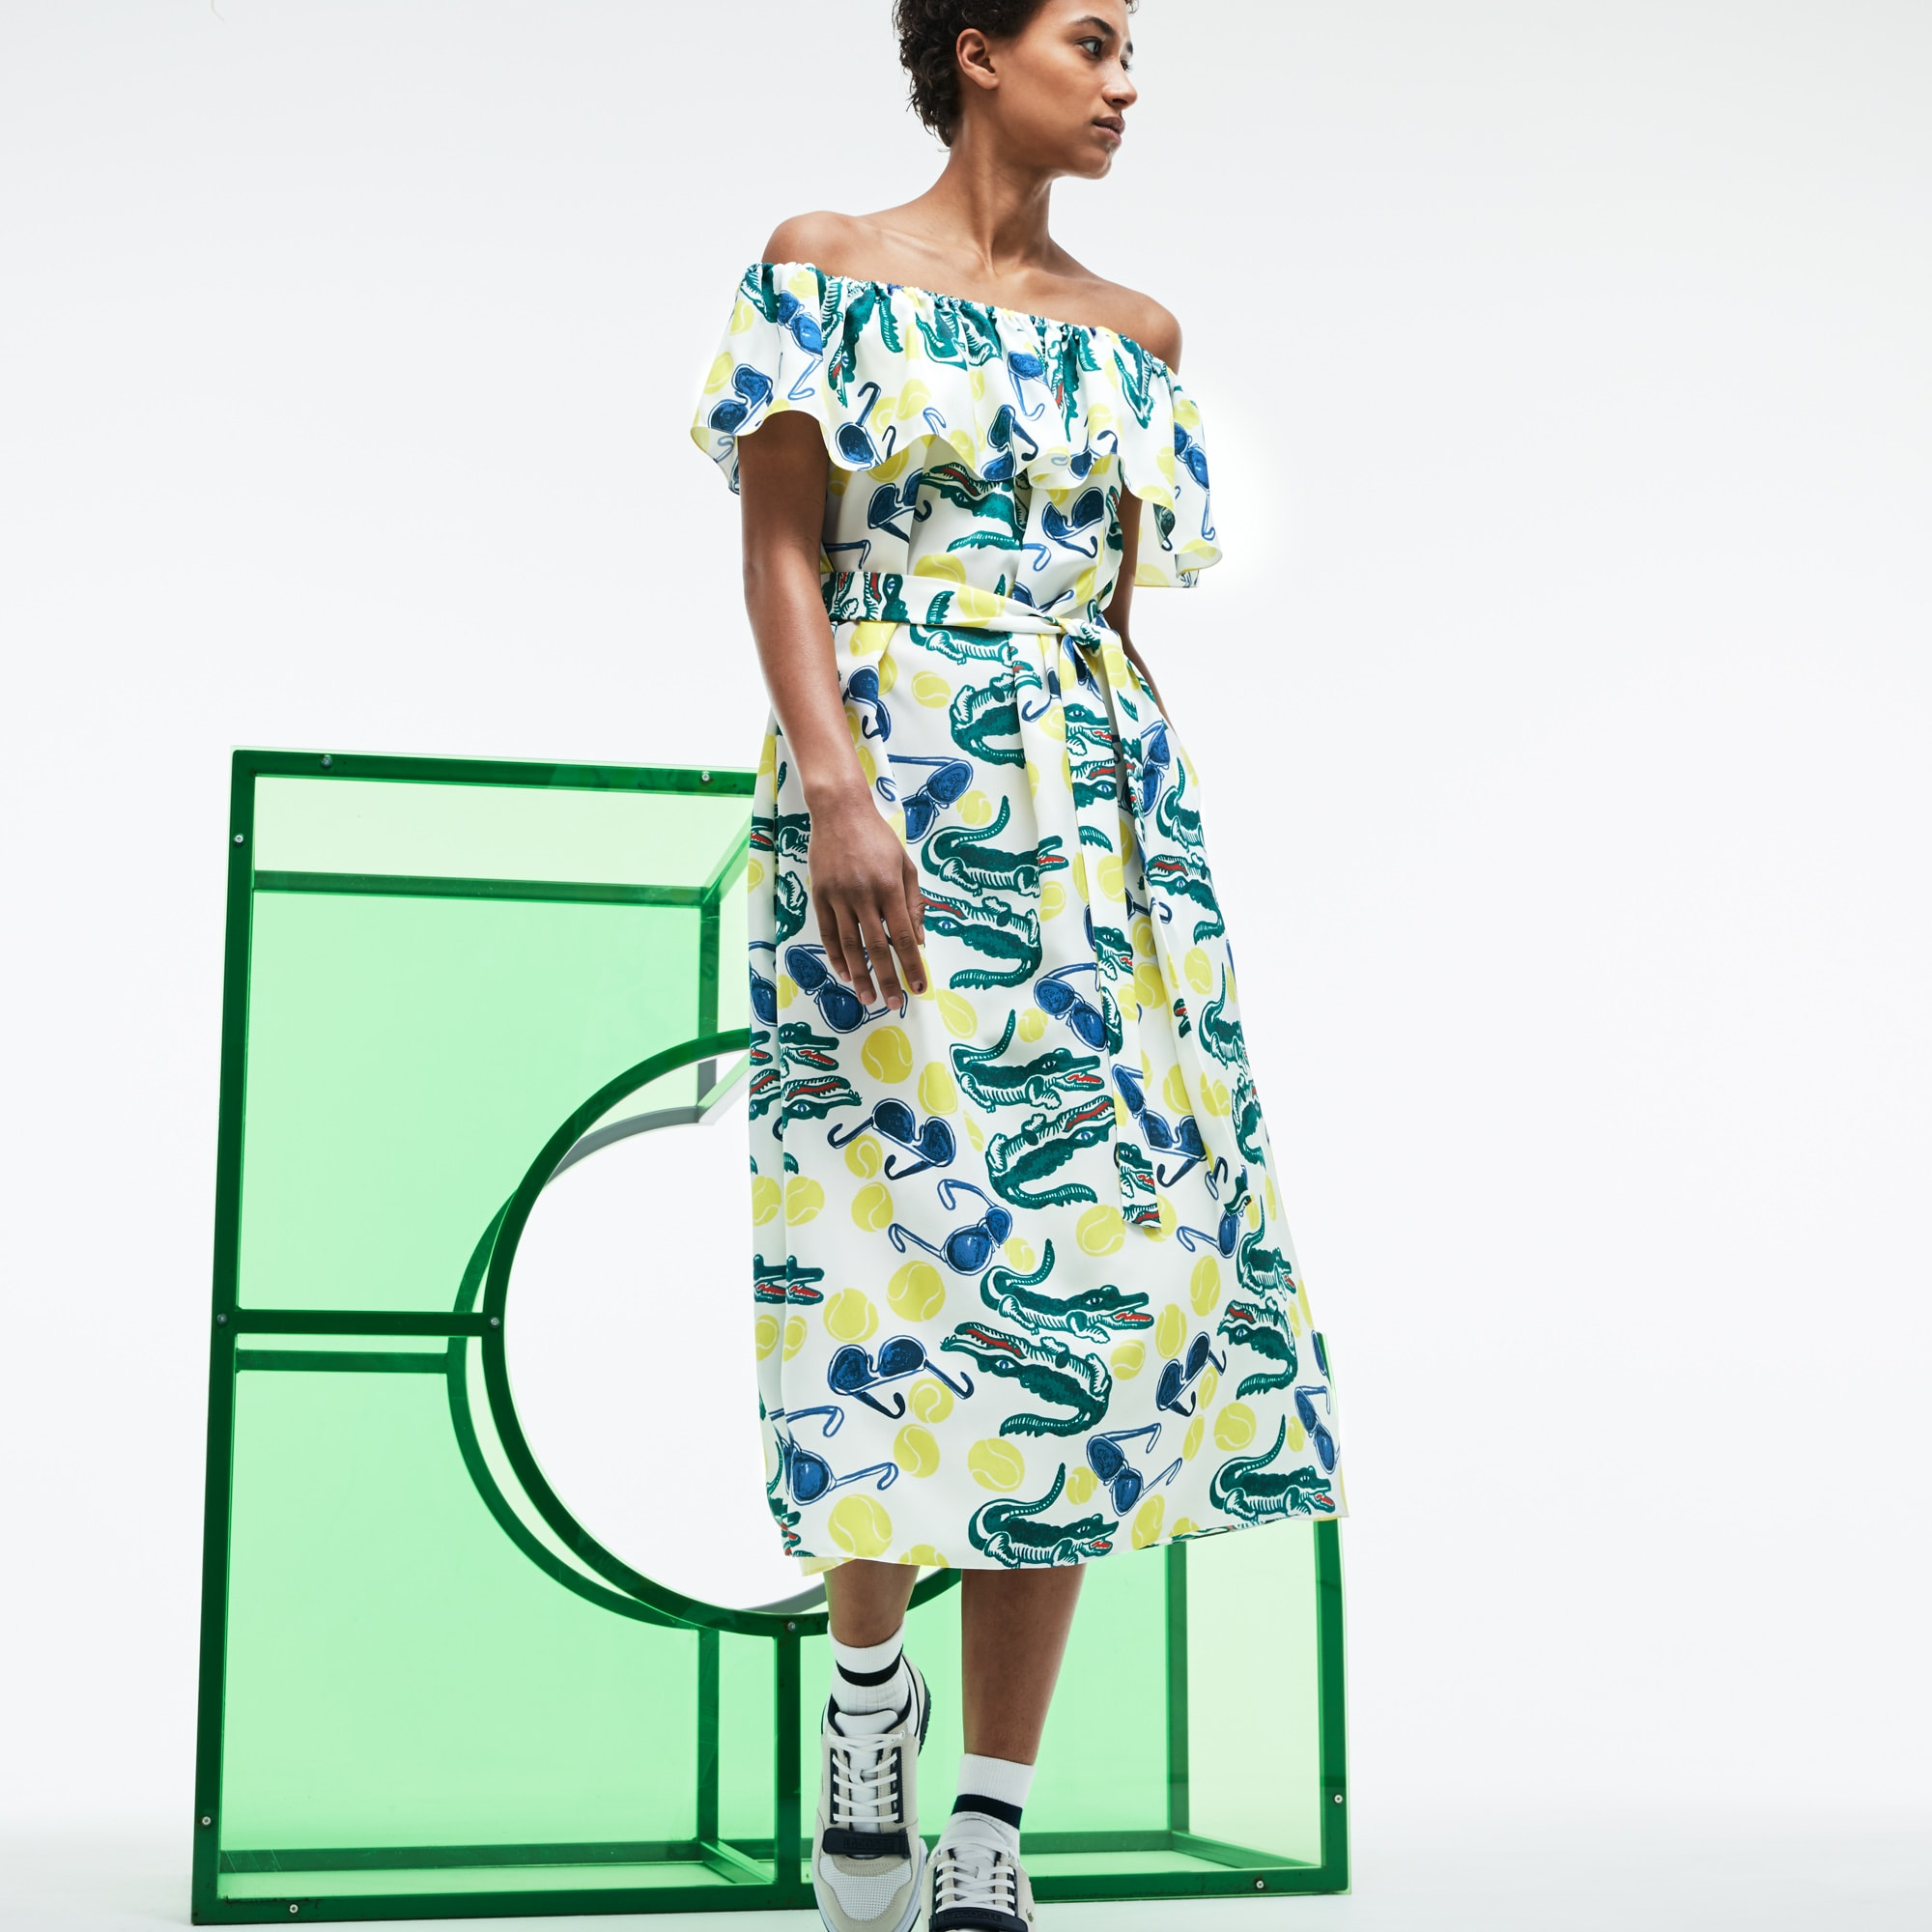 Women's Fashion Show MM Collab Print Knit Flounced Bustier Dress